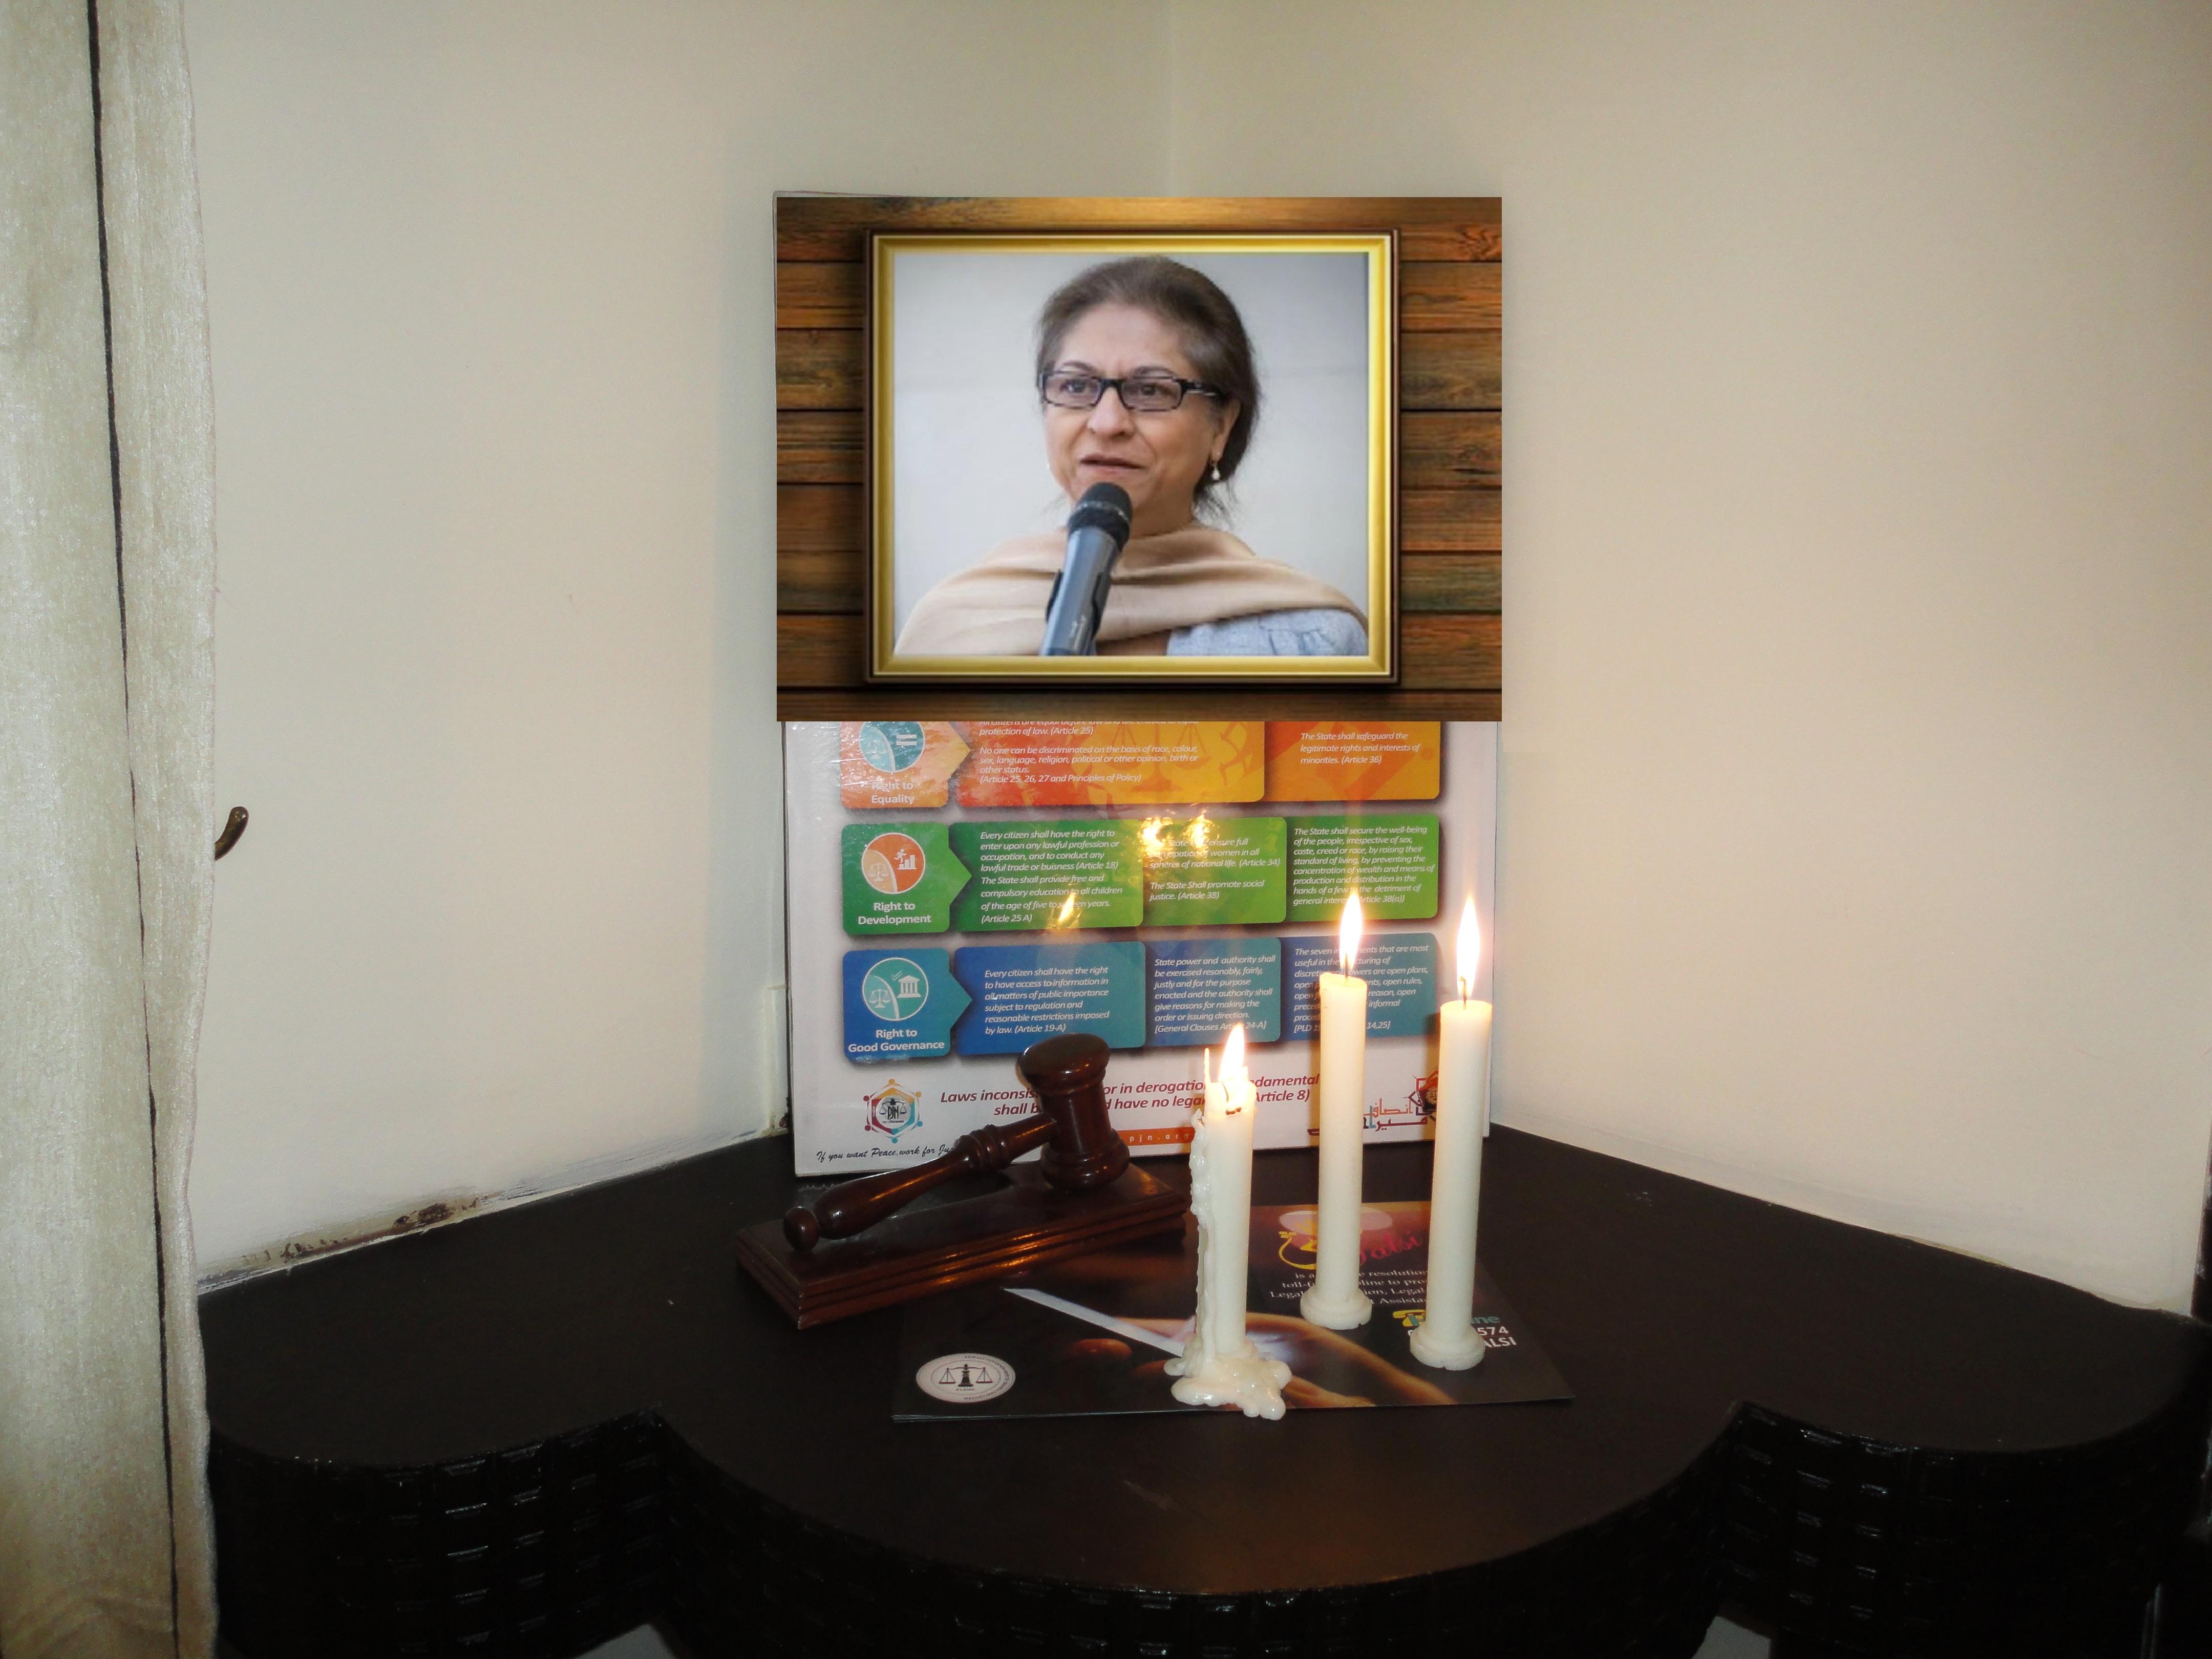 Remembering Asma Jahangir